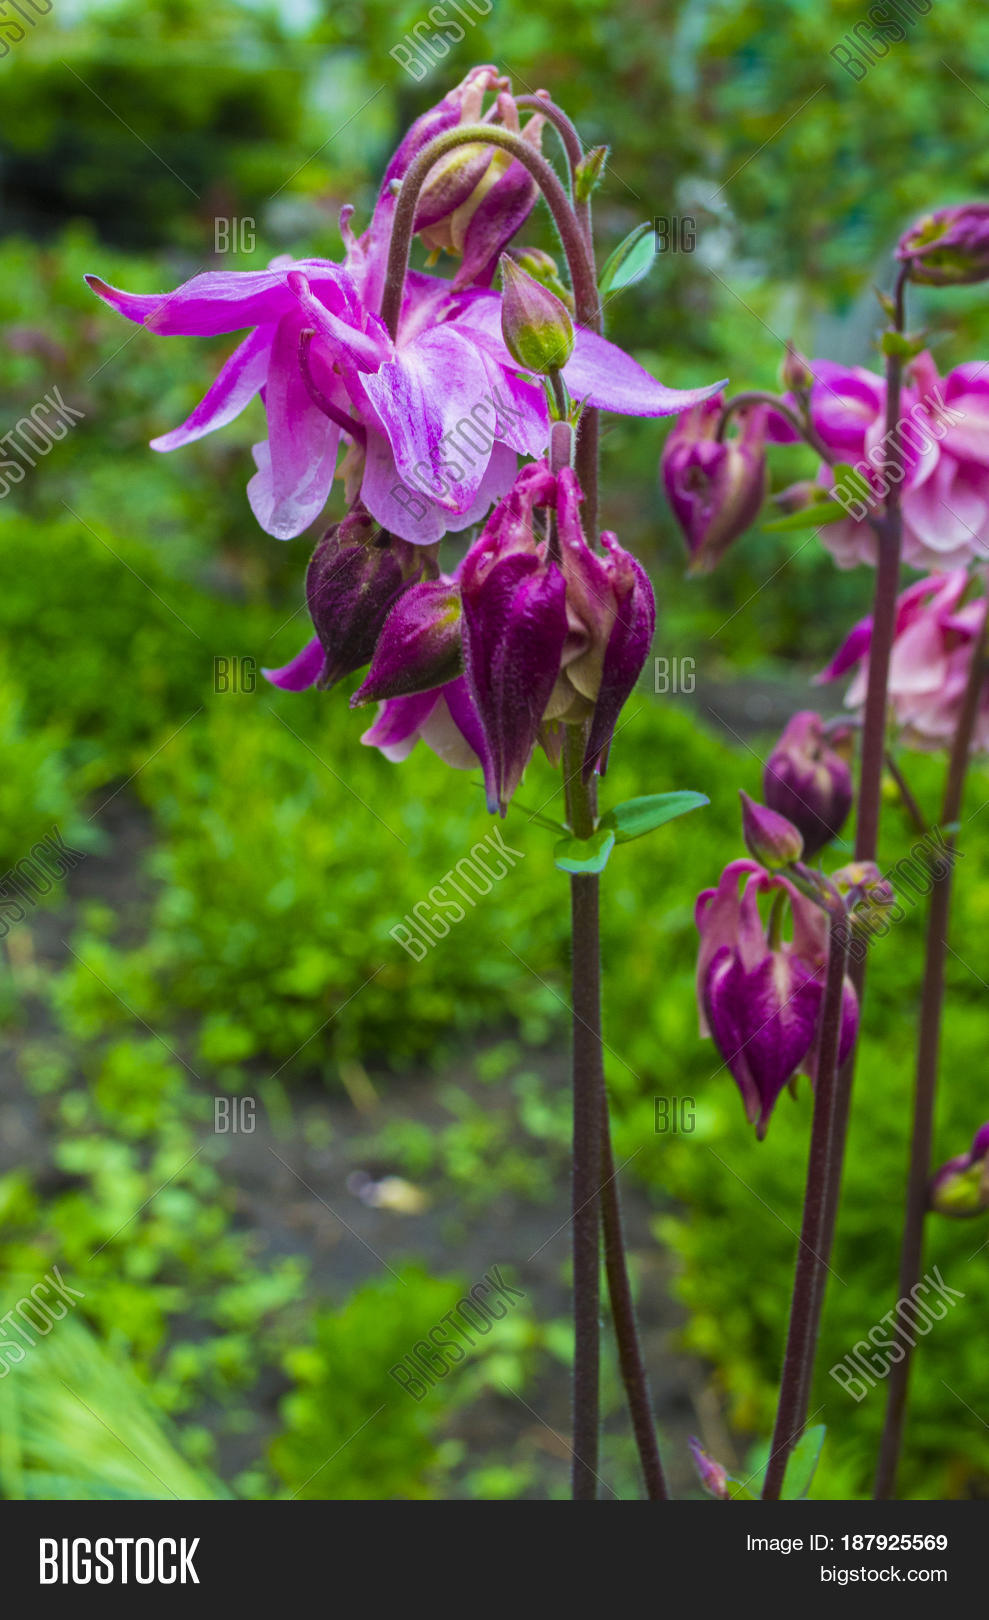 Columbine Flower On Image Photo Free Trial Bigstock